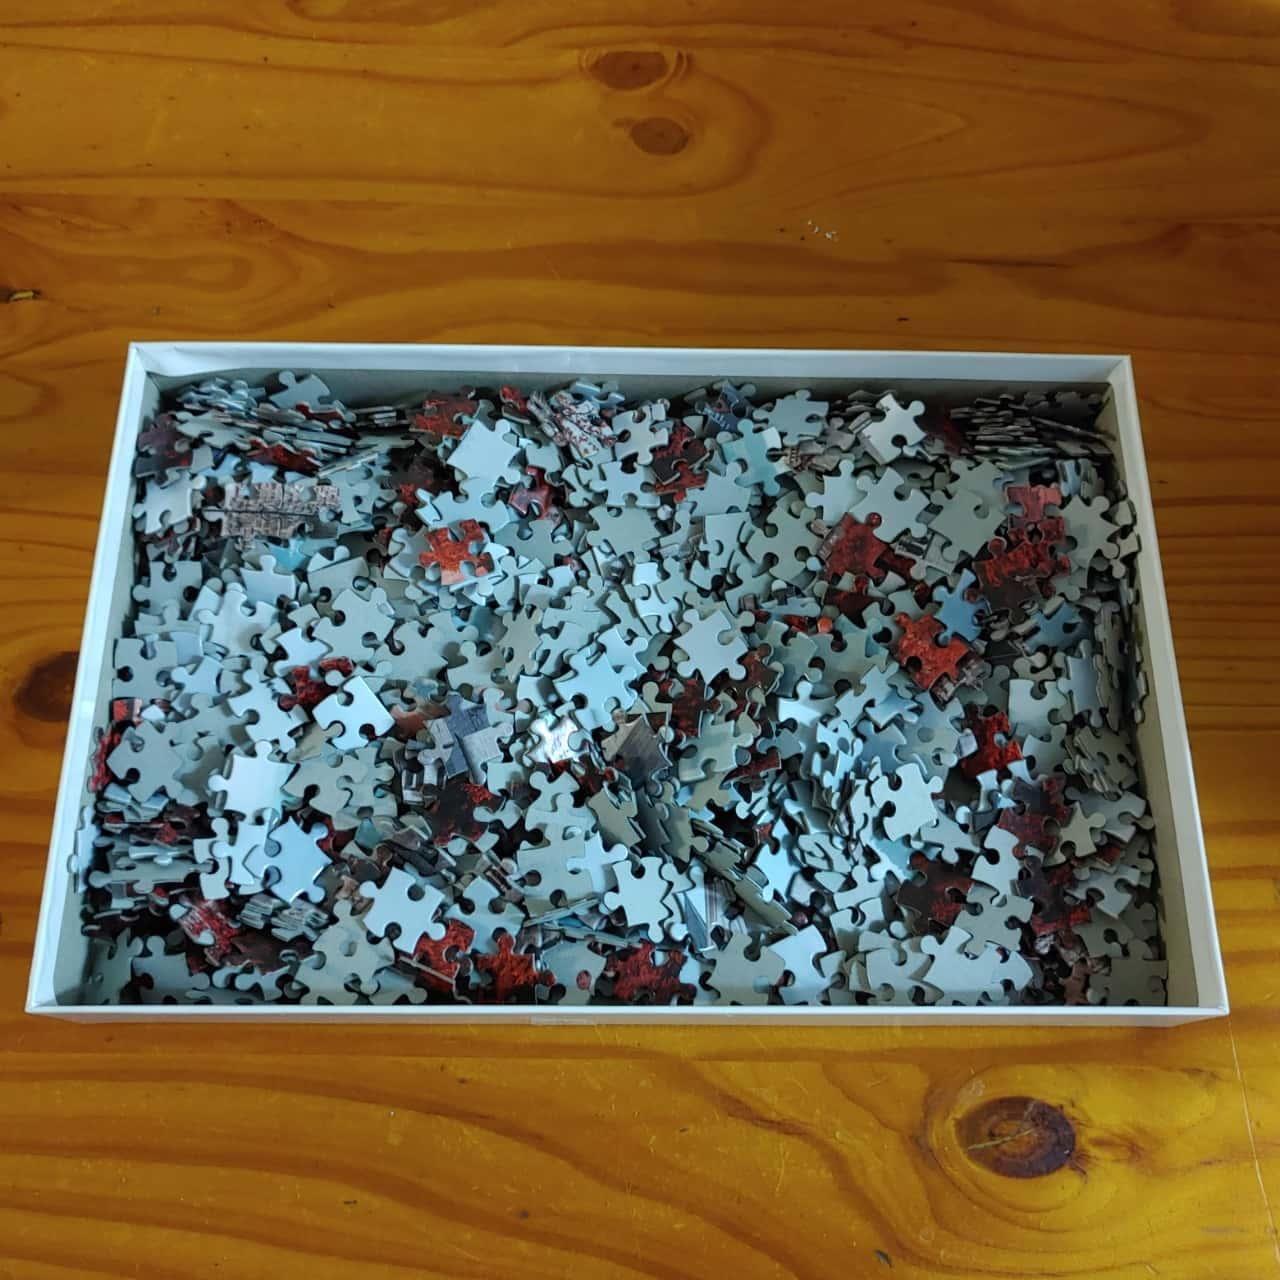 Hinkler Neuschwanstein Castle Germany 1000 Piece Jigsaw Puzzle